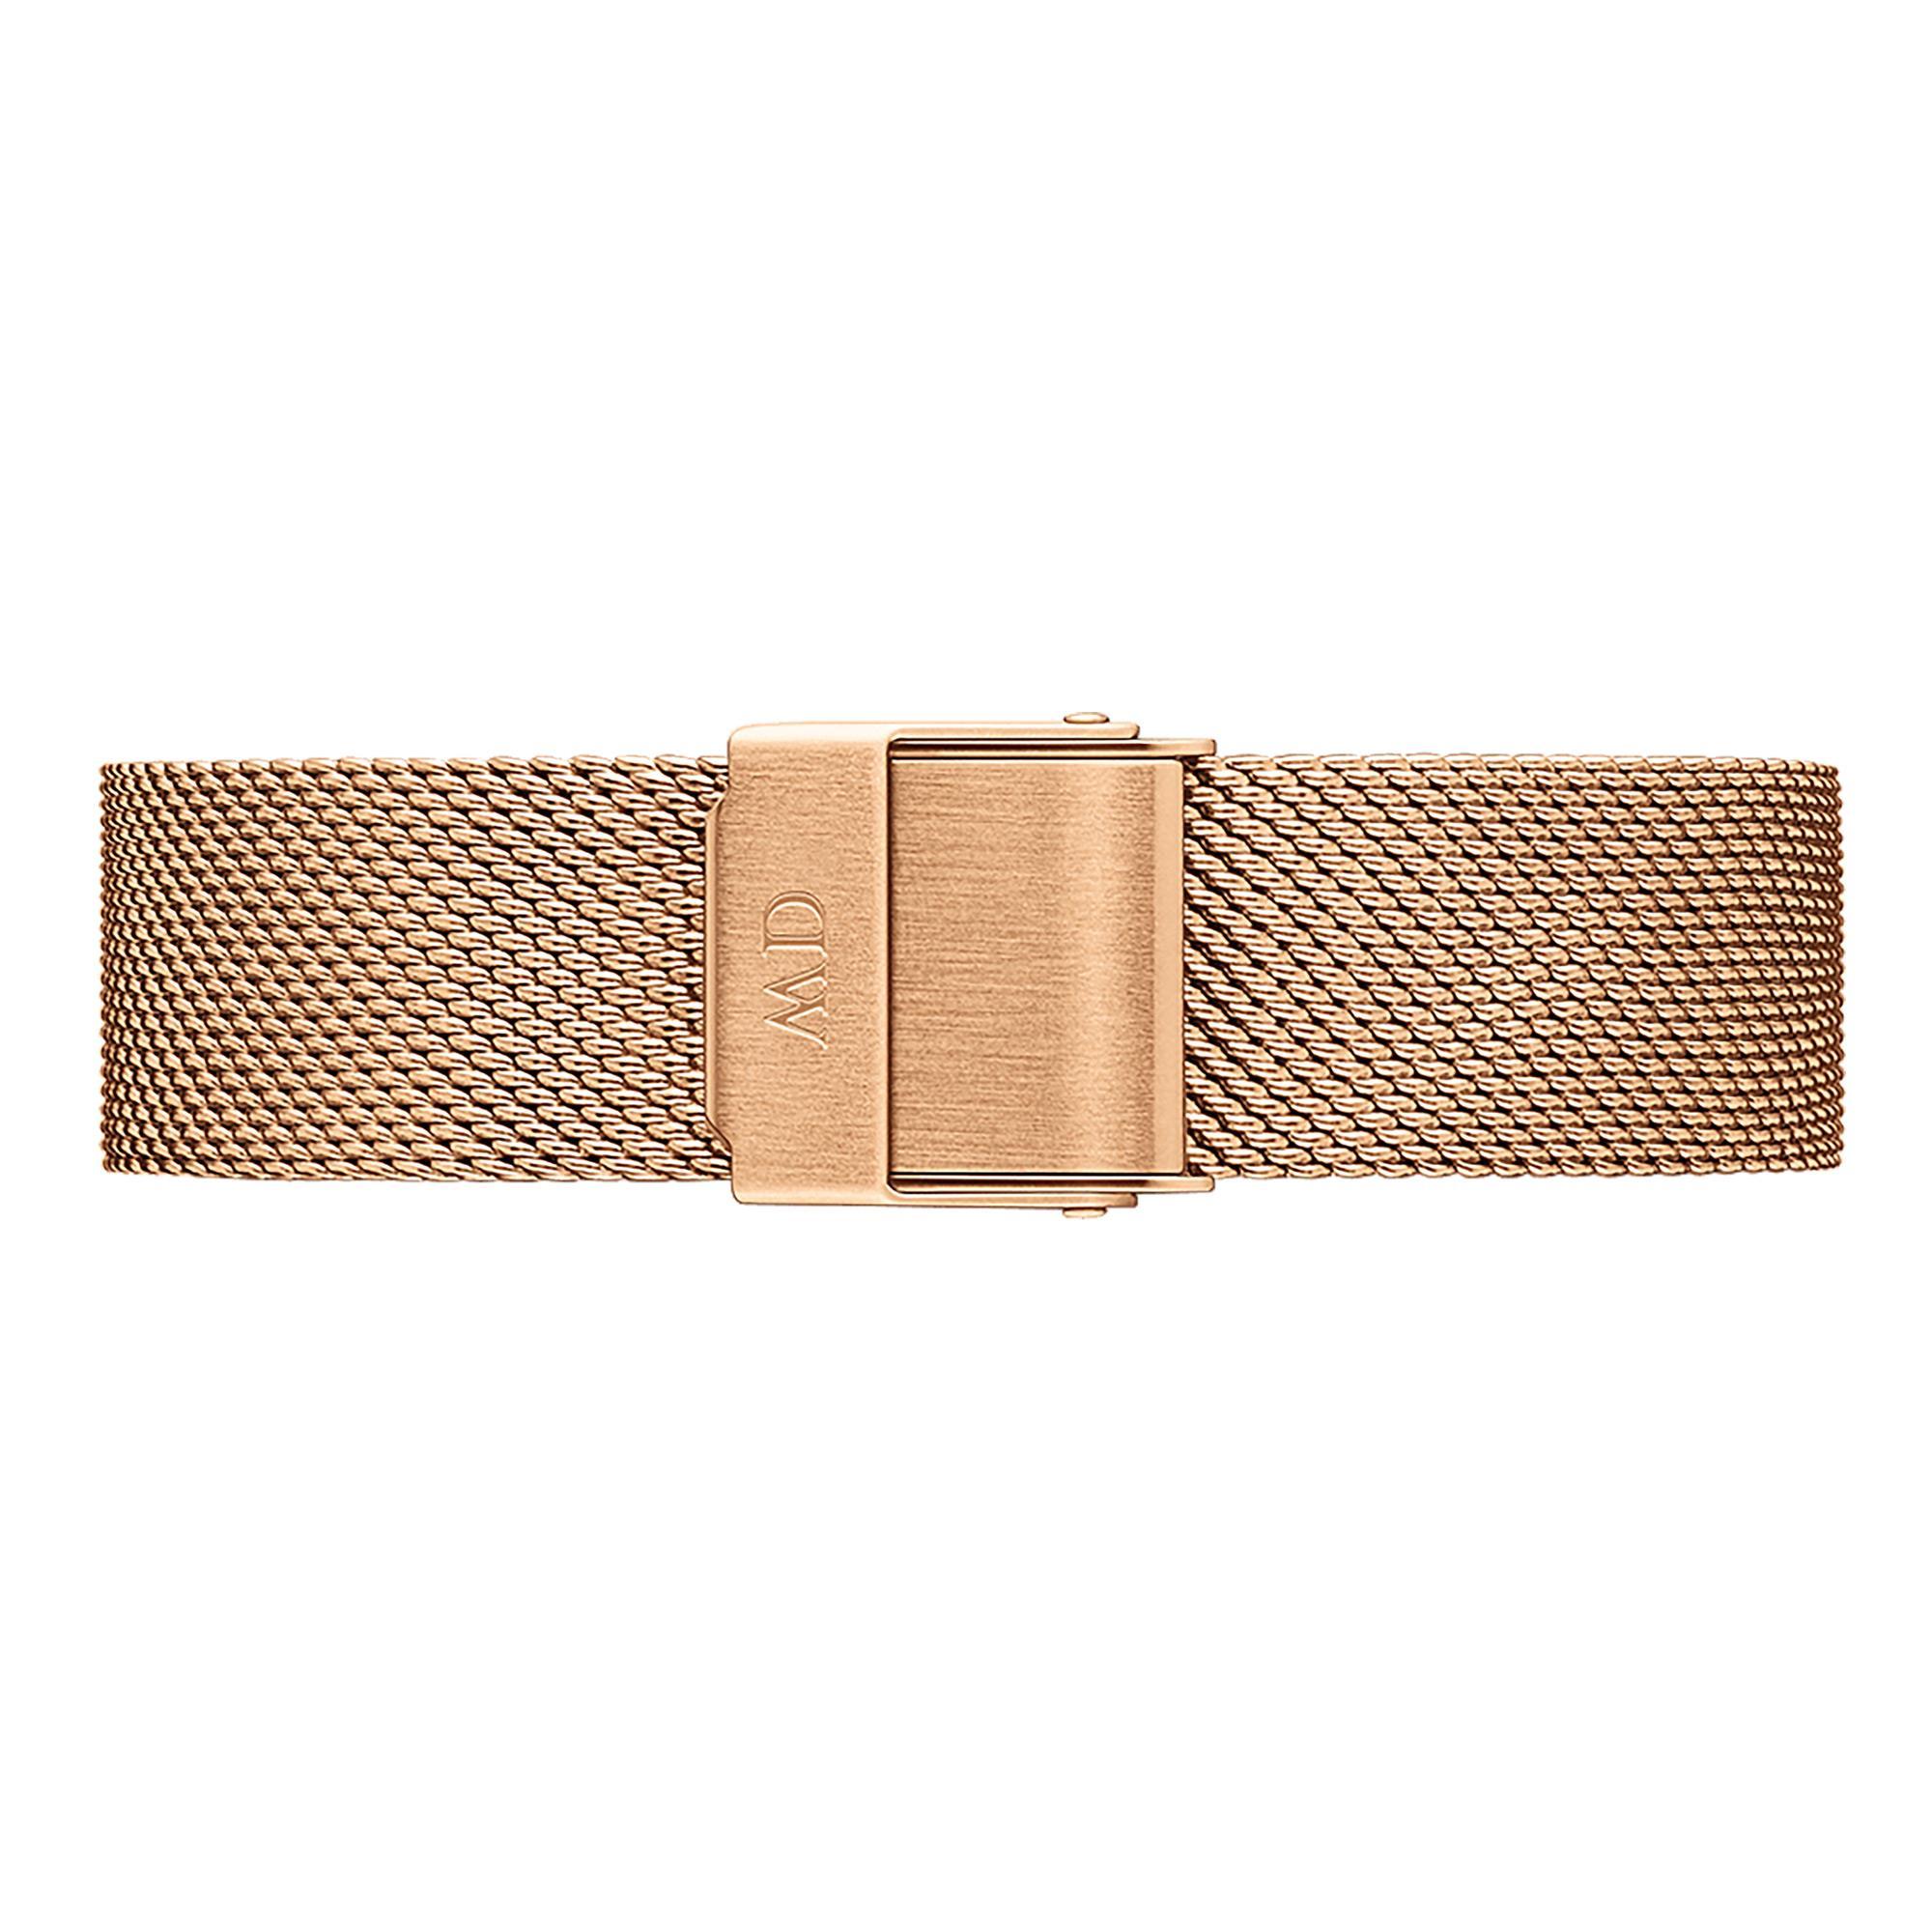 Cinturino Classic Petite Melrose Acciaio Oro Rosa Donna 14mm DW00200139 - DANIEL WELLINGTON